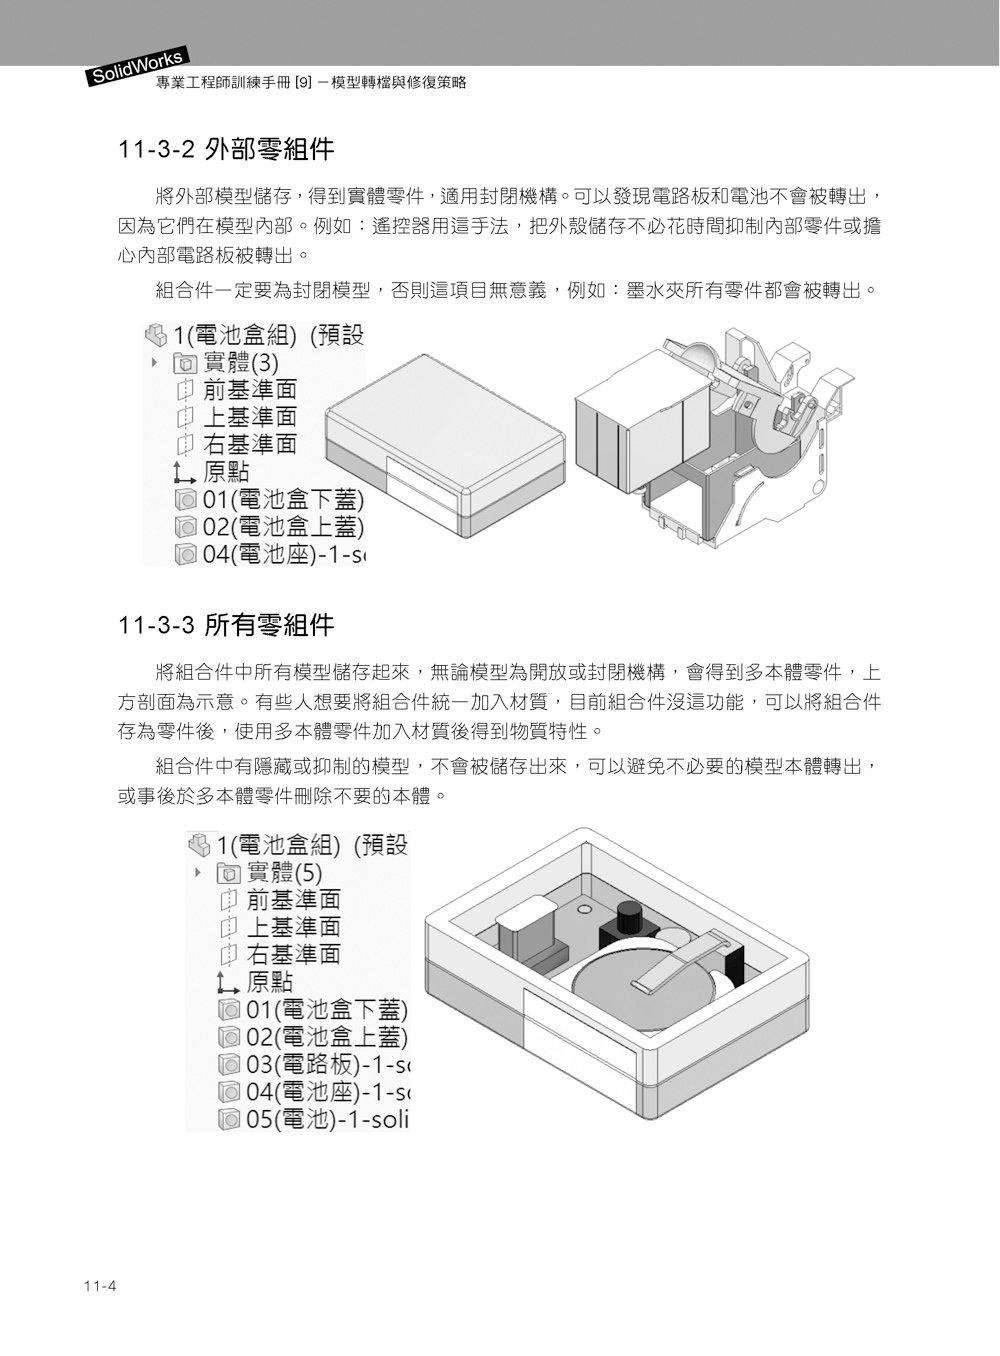 Solidworks 專業工程師訓練手冊[9]-模型轉檔與修復策略-preview-12